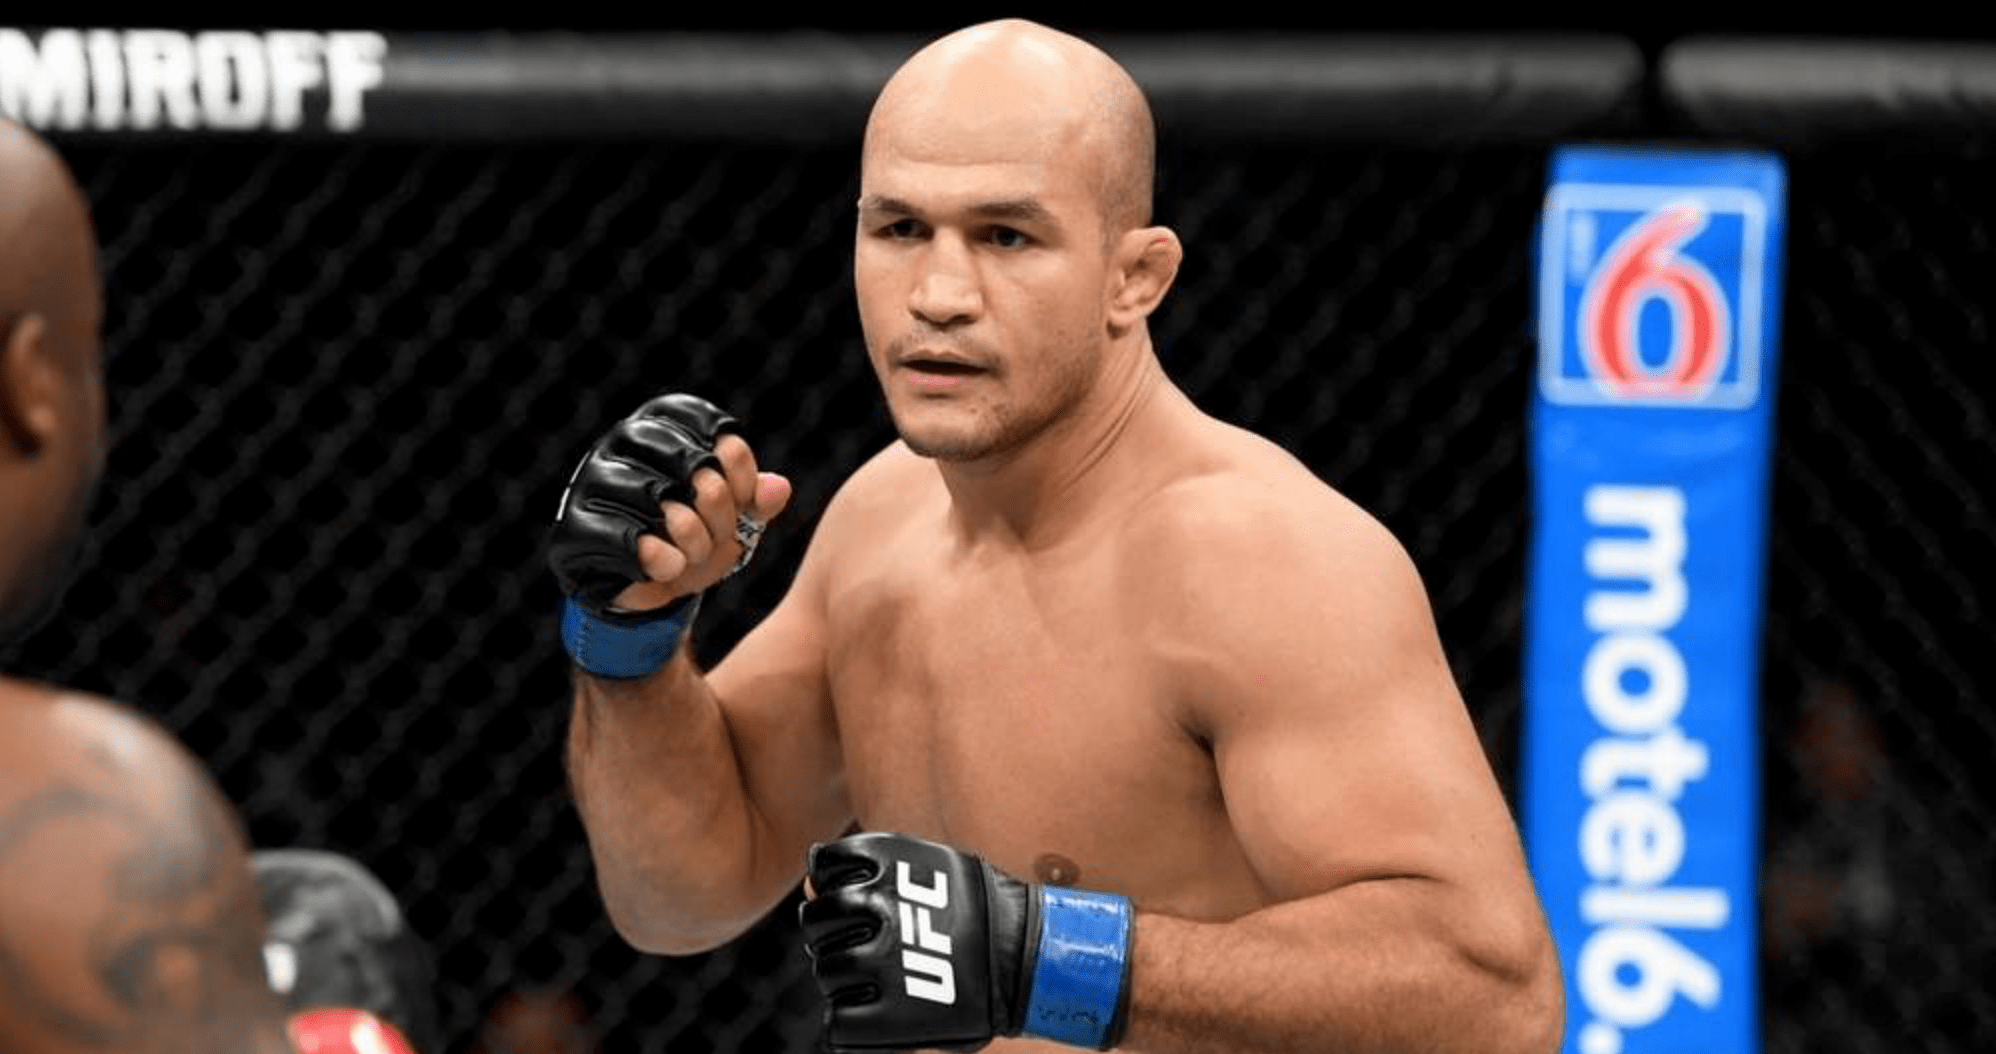 UFC: Junior Dos Santos Addresses His Three Recent Losses